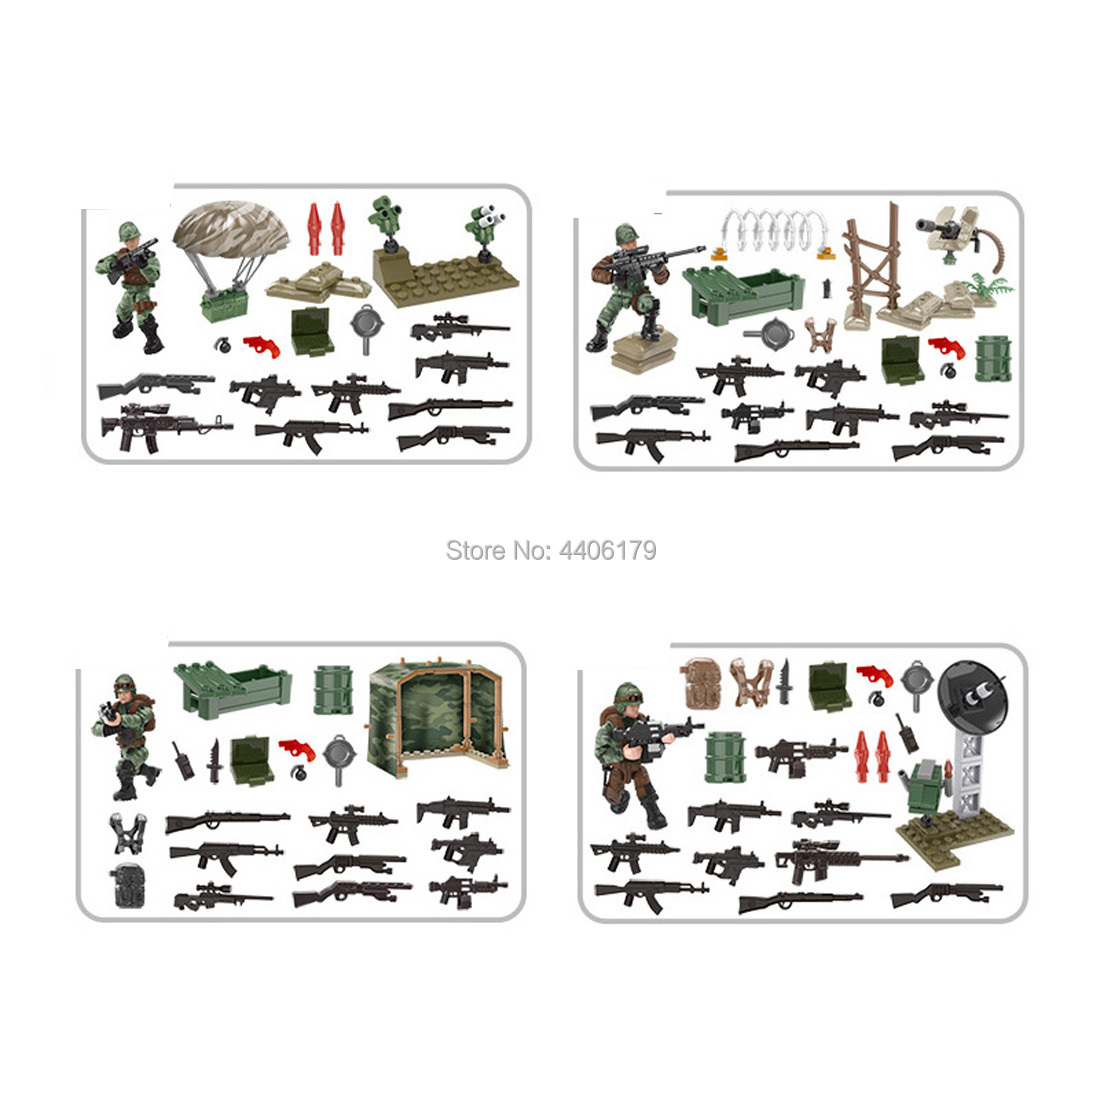 hot LegoINGlys military ww2 Airborne soldier Jungle assault war Building Blocks mini weapon figures brick toys for children gift